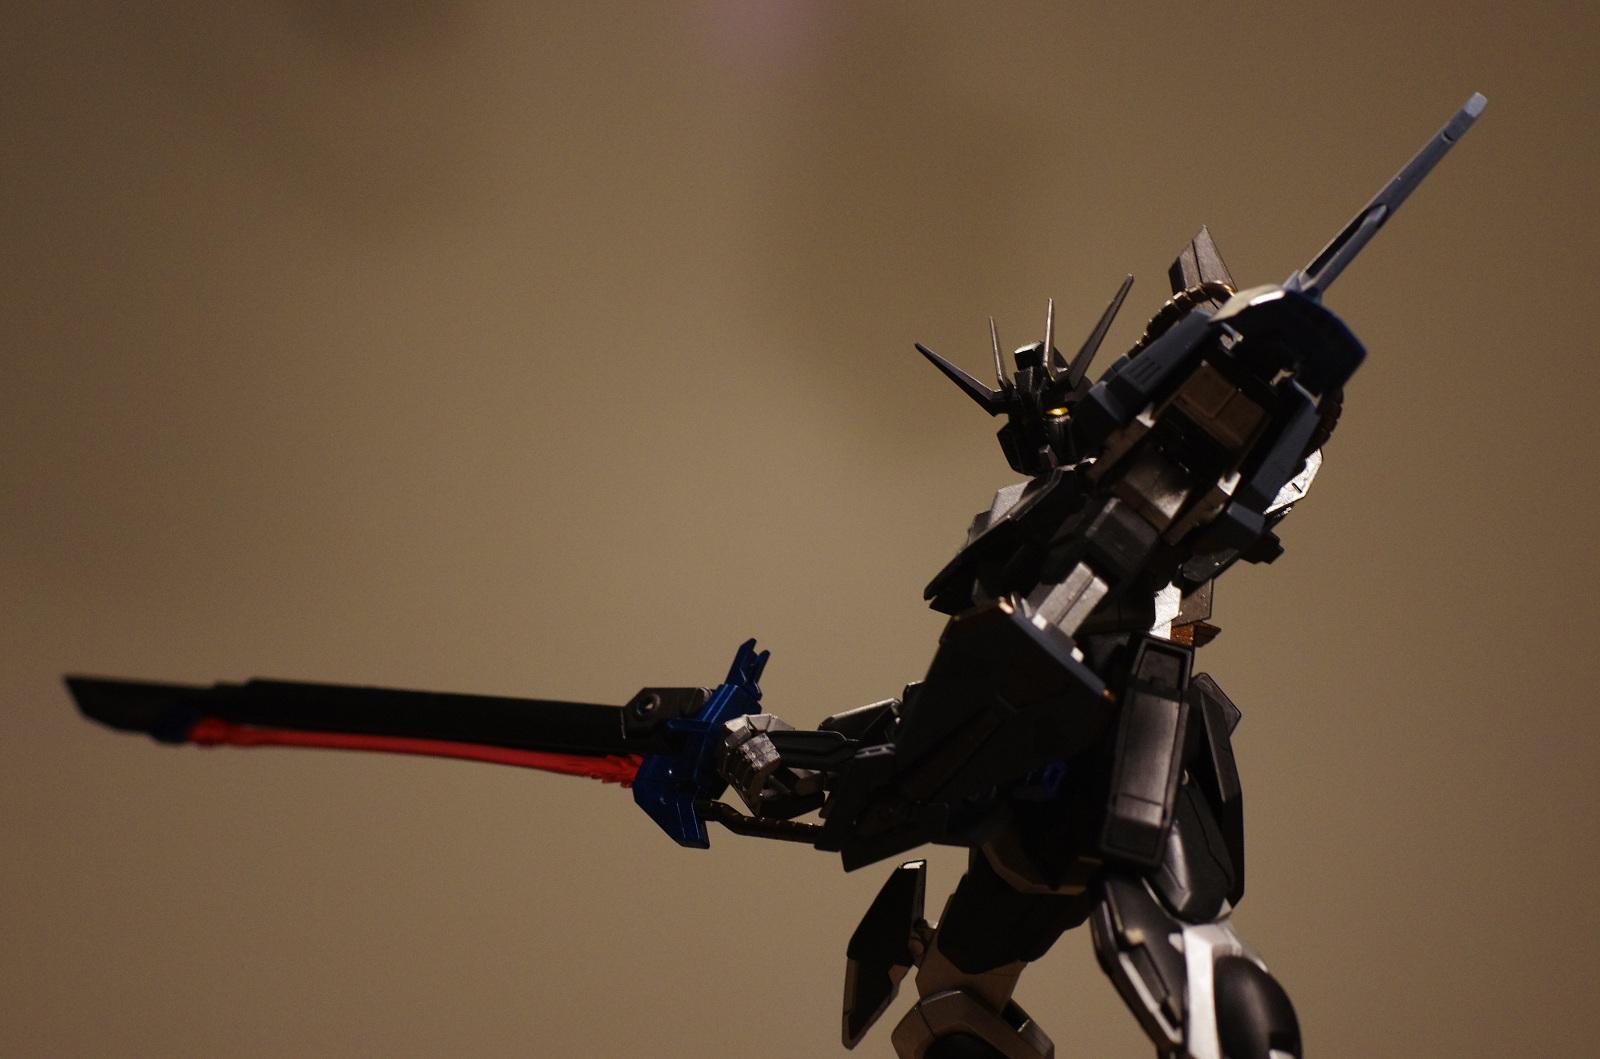 K5模型攝影分享: Launcher/Sword Strike Gundam: Countach